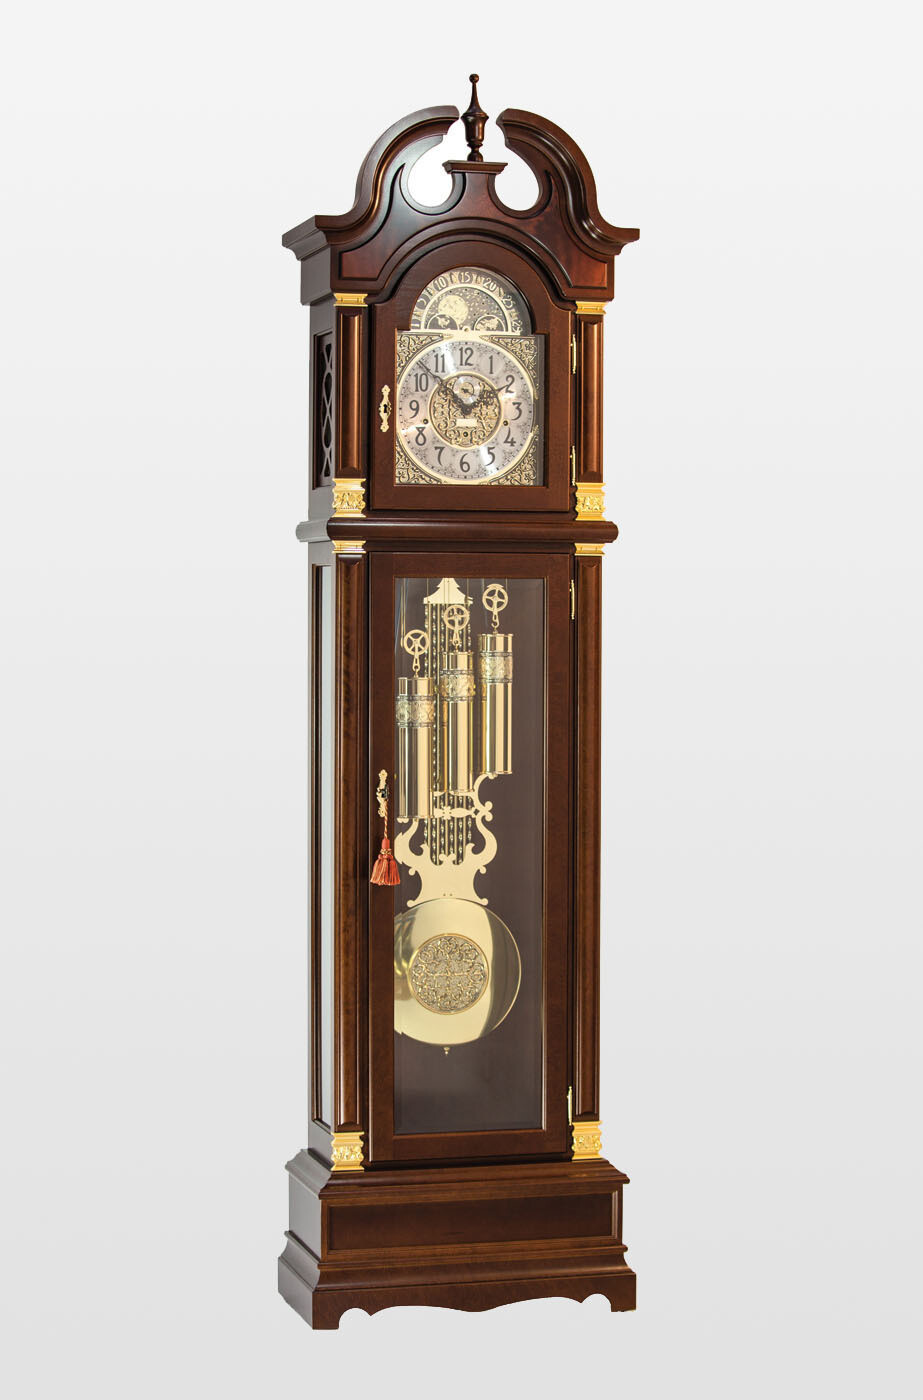 Billib Guildhall Grandfather Clock in Walnut Finish